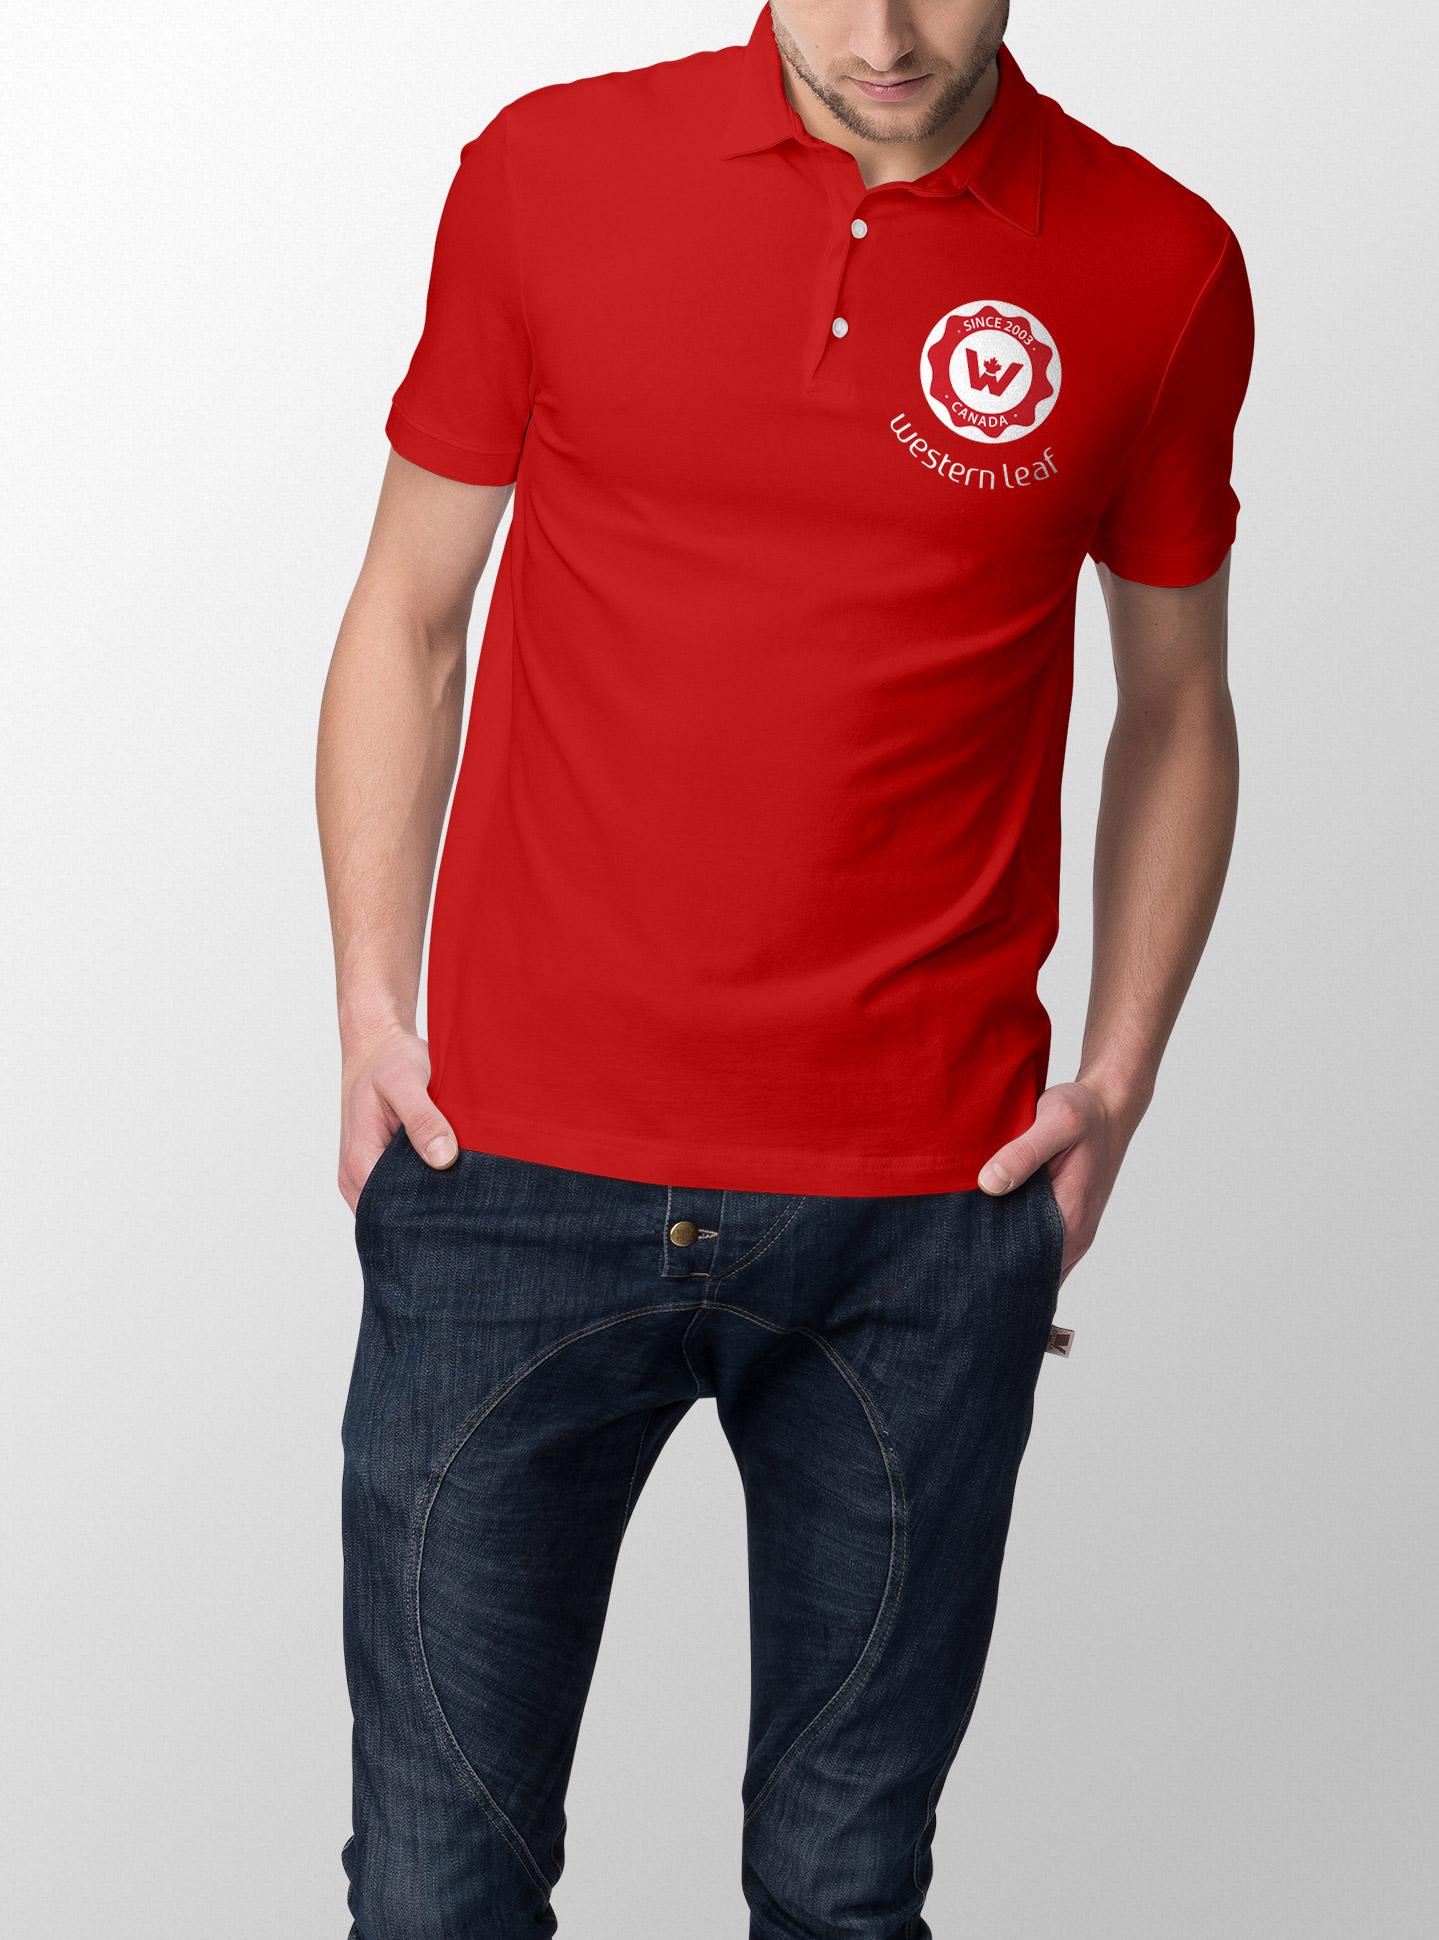 male shirt design